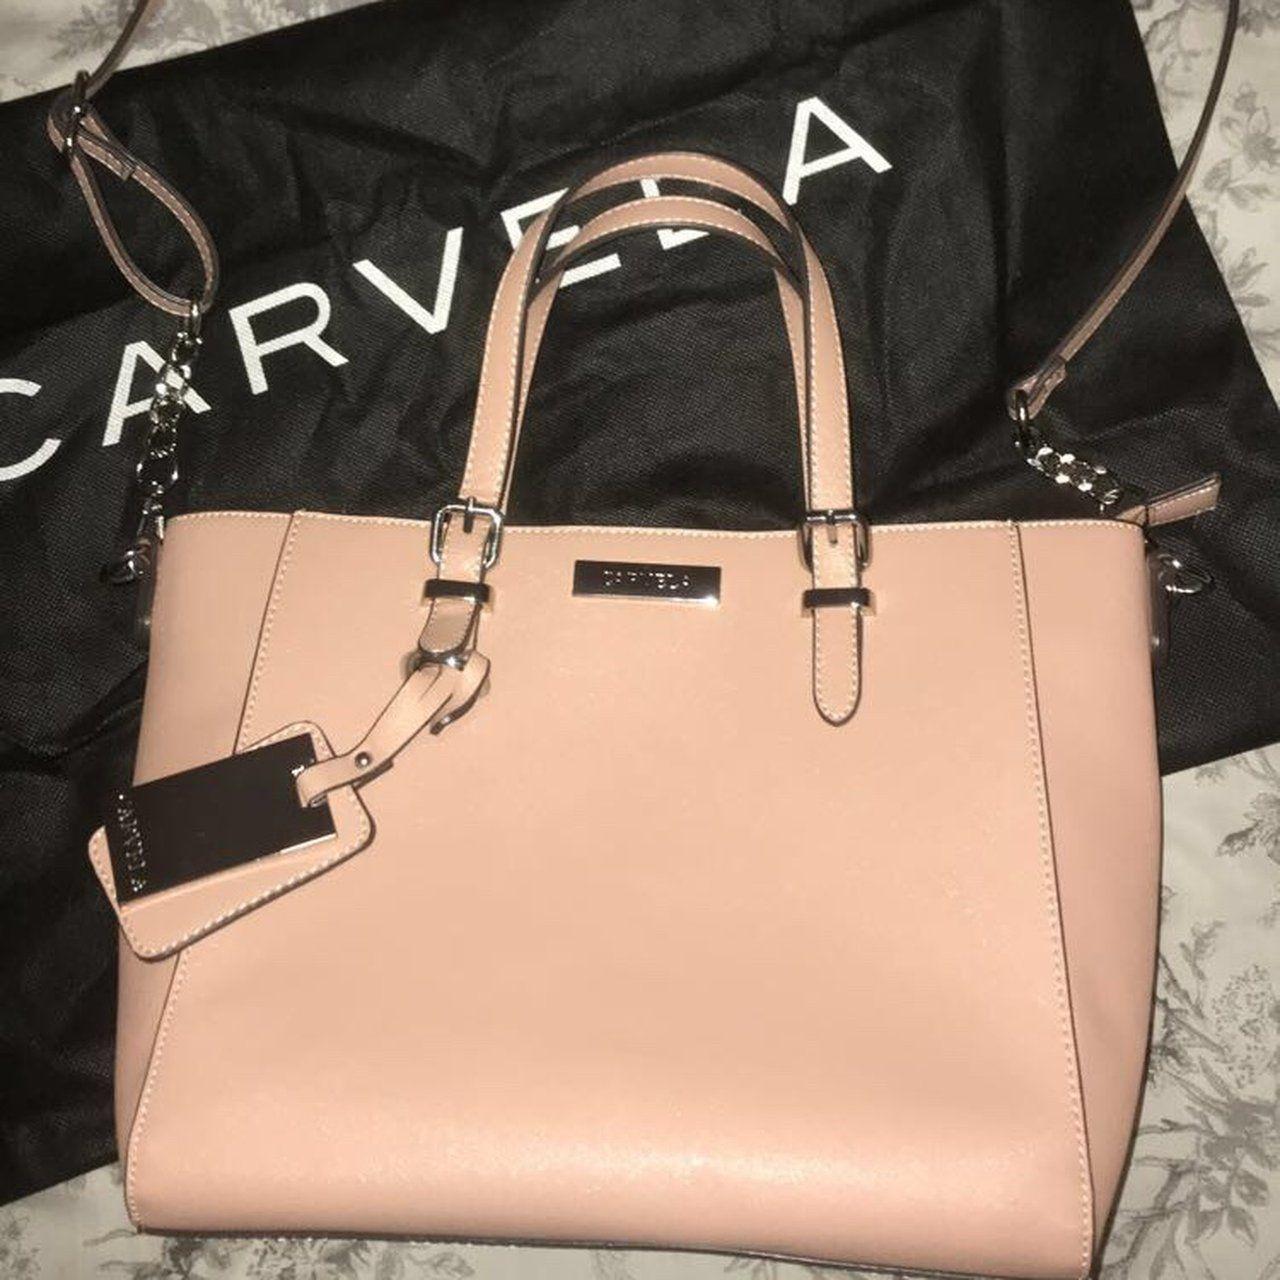 c4f1b10f9298 Brand new Kurt Geiger Carvella bag in a nude pink colour. is - Depop